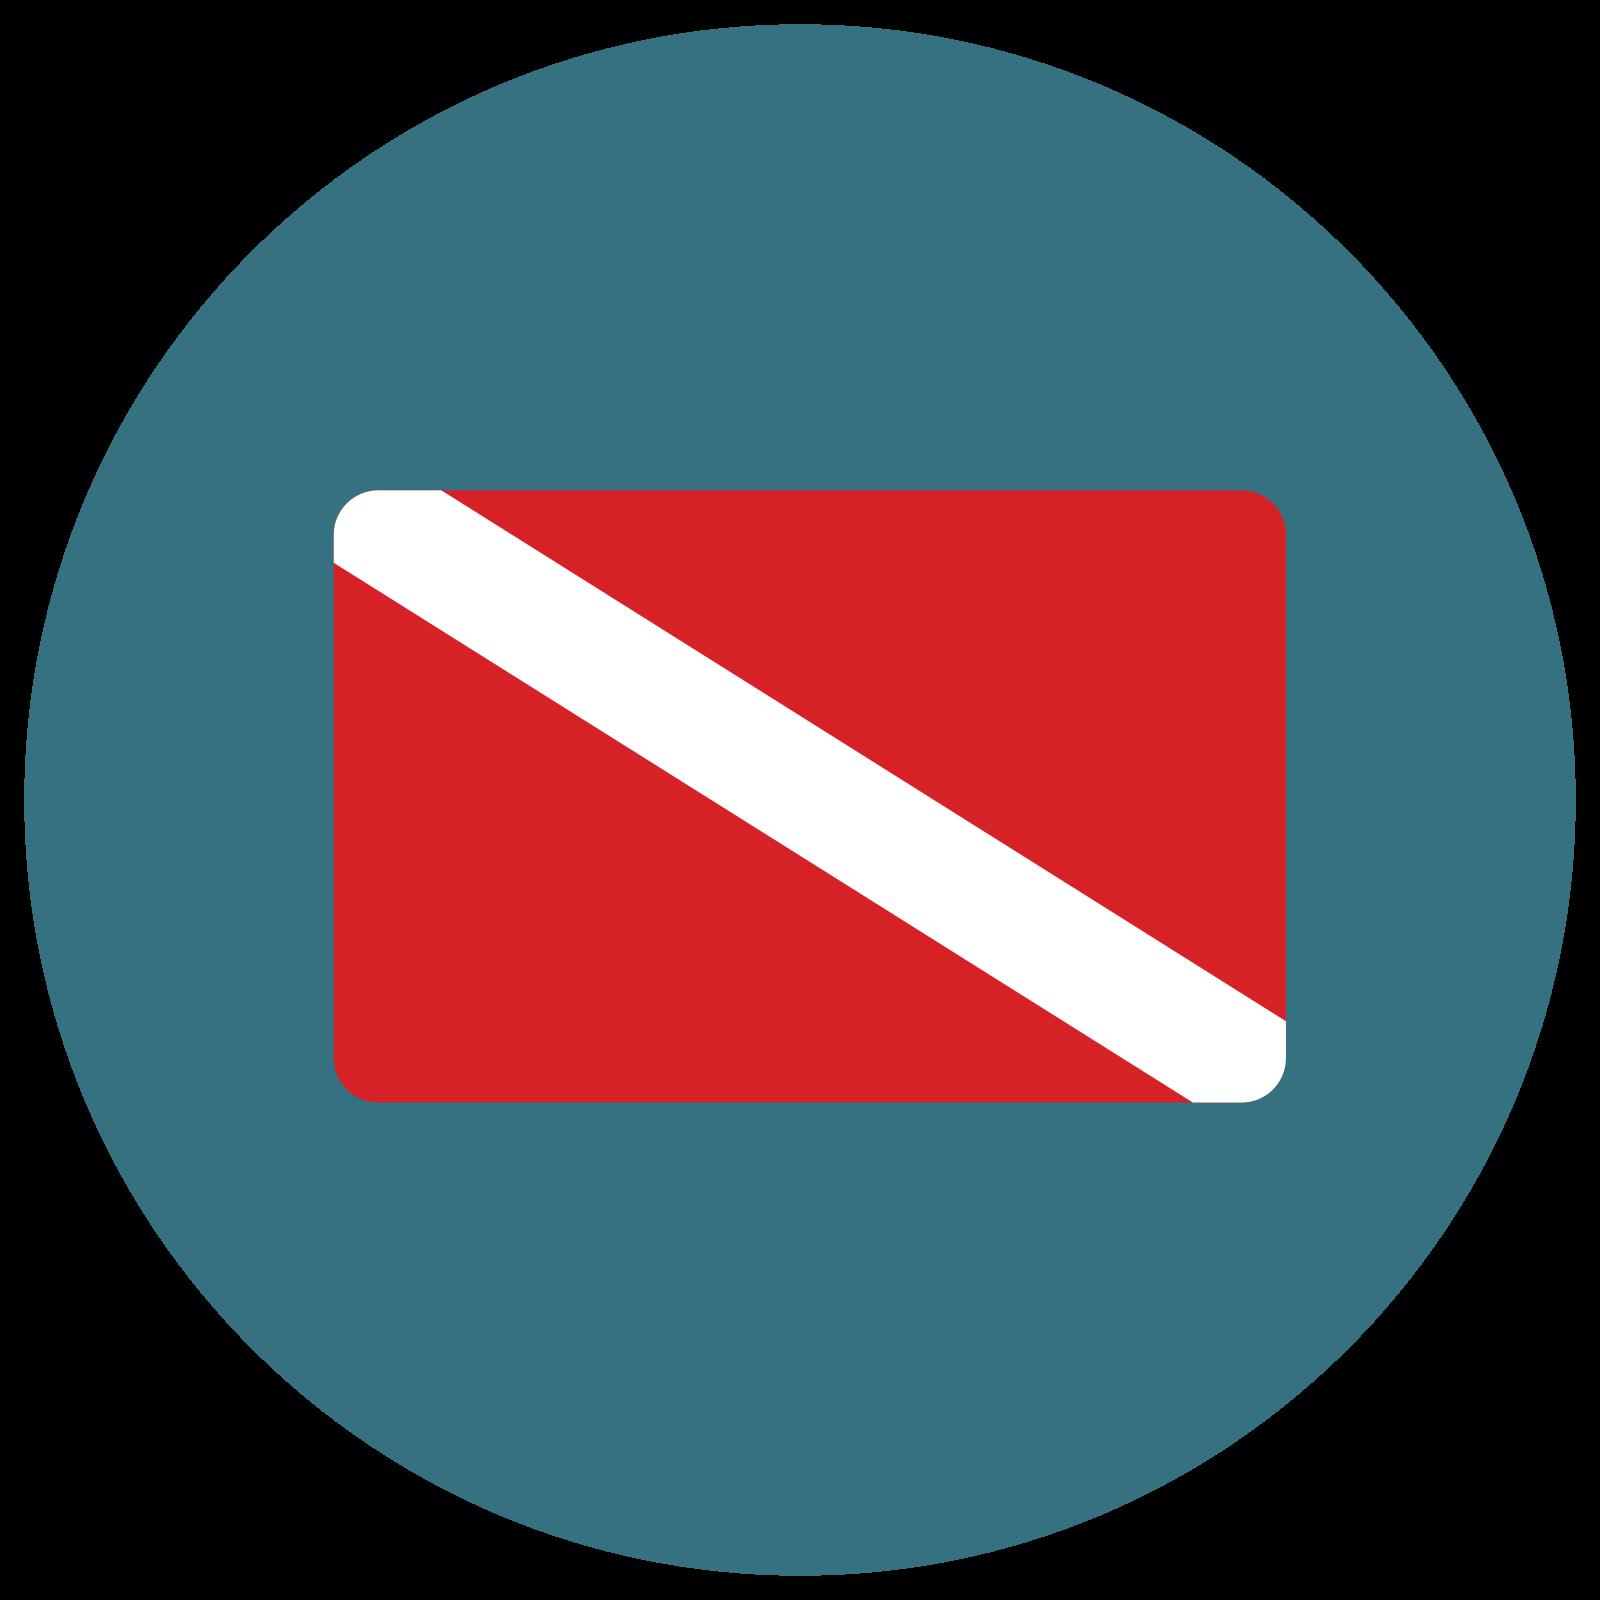 Divers Flag icon